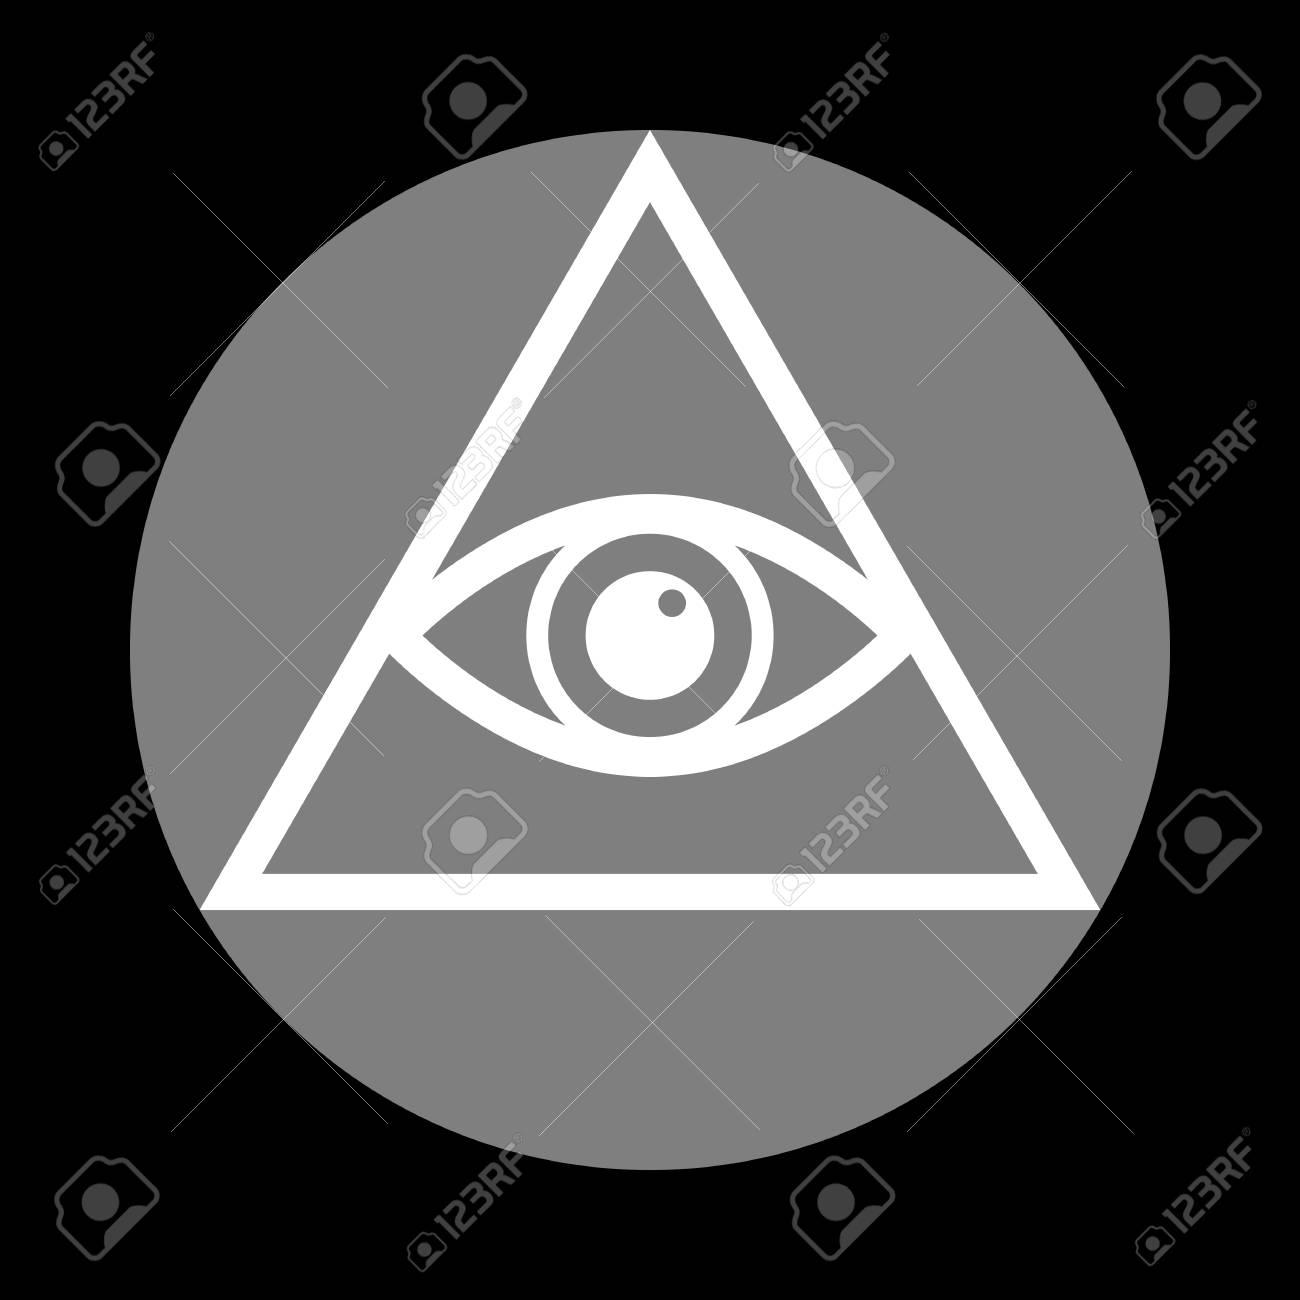 All Seeing Eye Pyramid Symbol Freemason And Spiritual White Icon In Gray Circle At